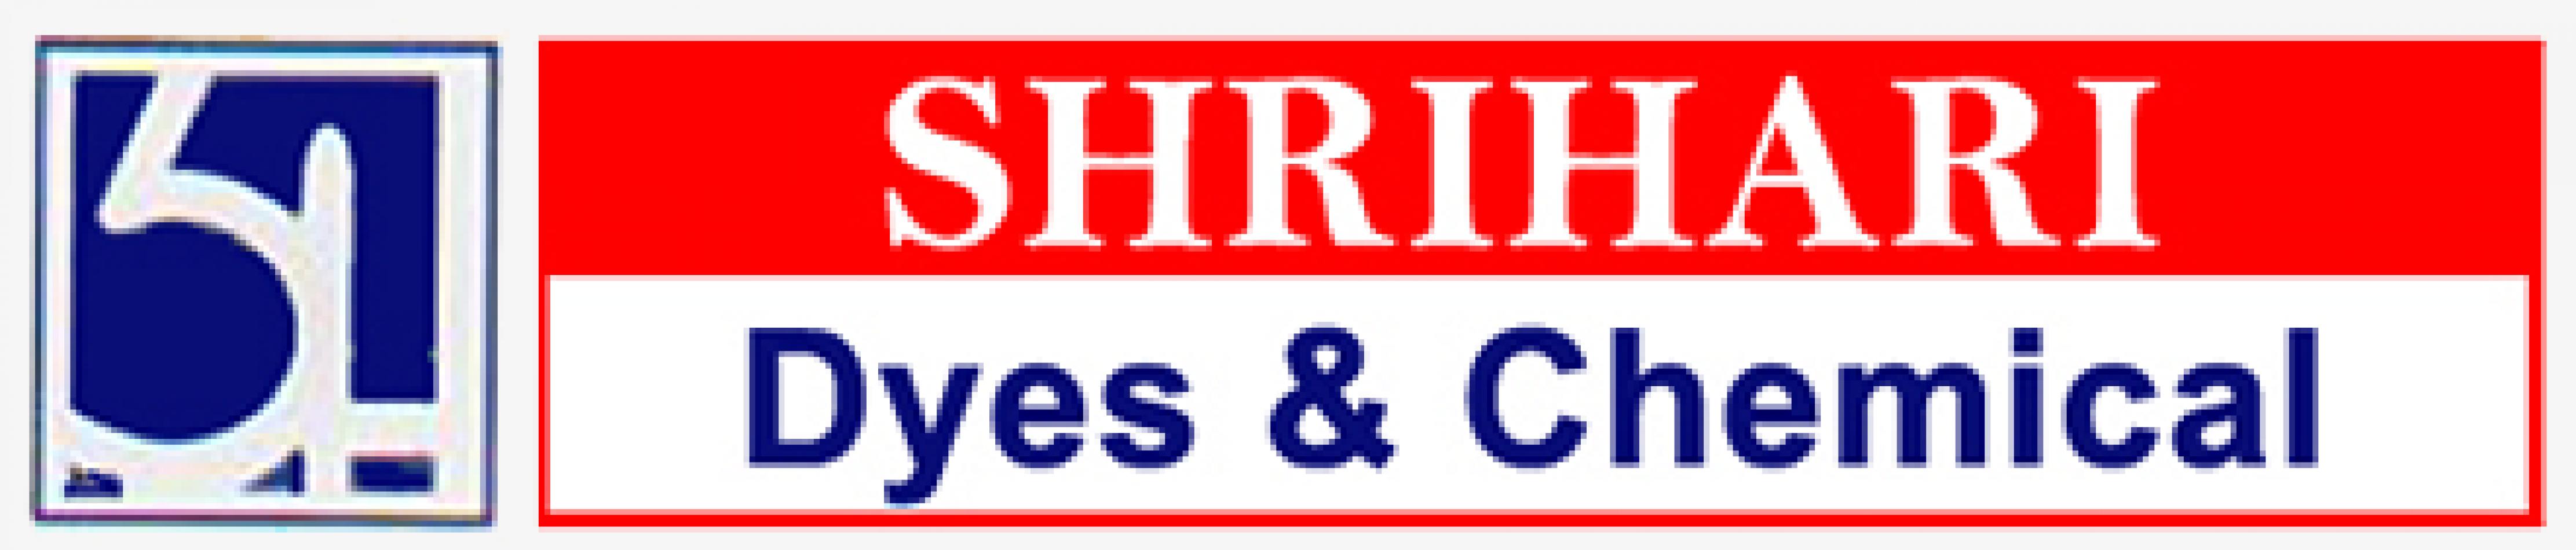 SHRI HARI DYES AND CHEMICALS